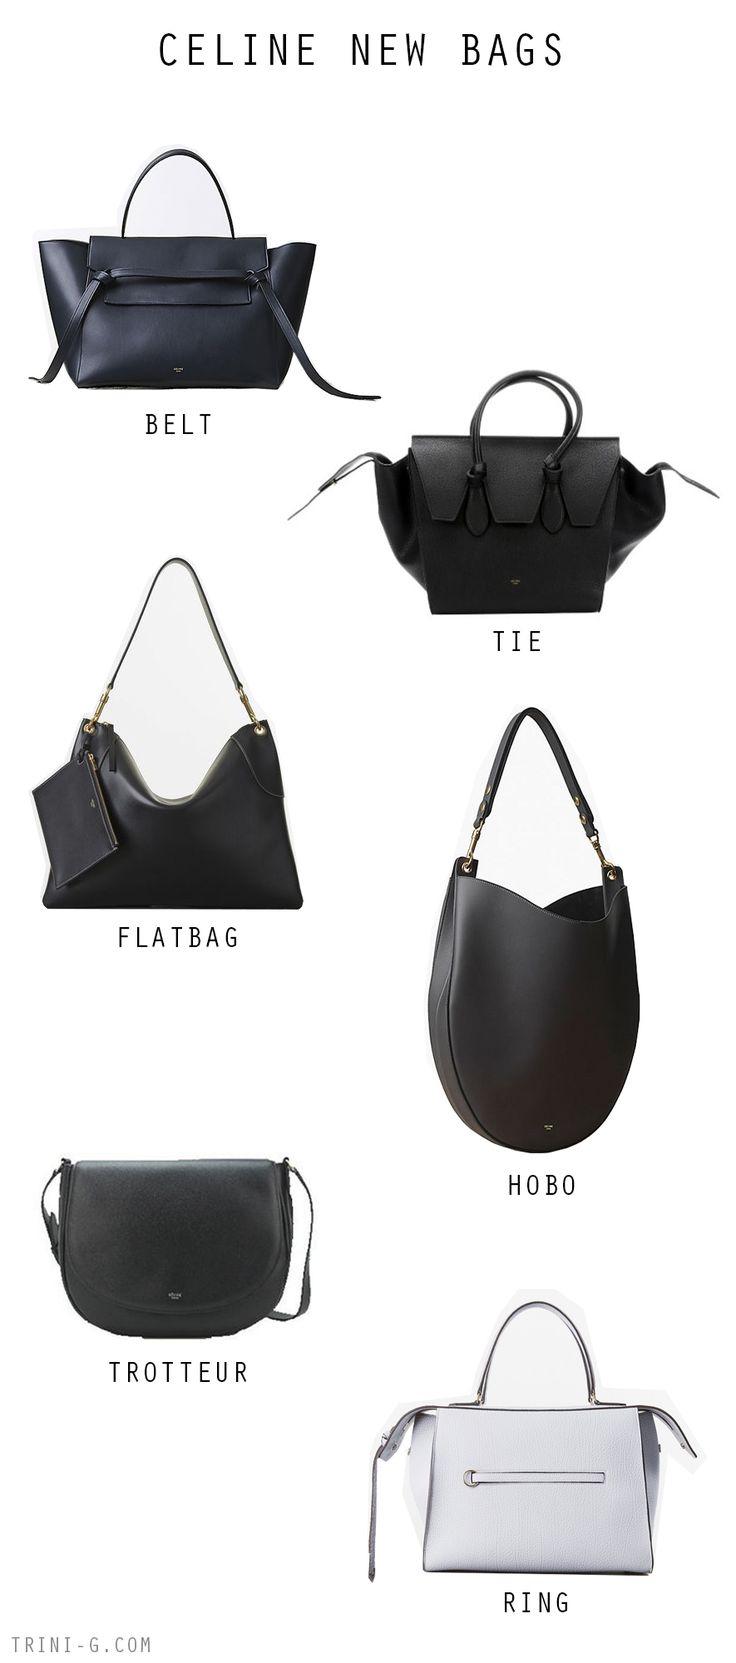 Trini blog   Celine newer bags Clothing, Shoes & Jewelry : Women : Handbags & Wallets http://amzn.to/2lvjsr9